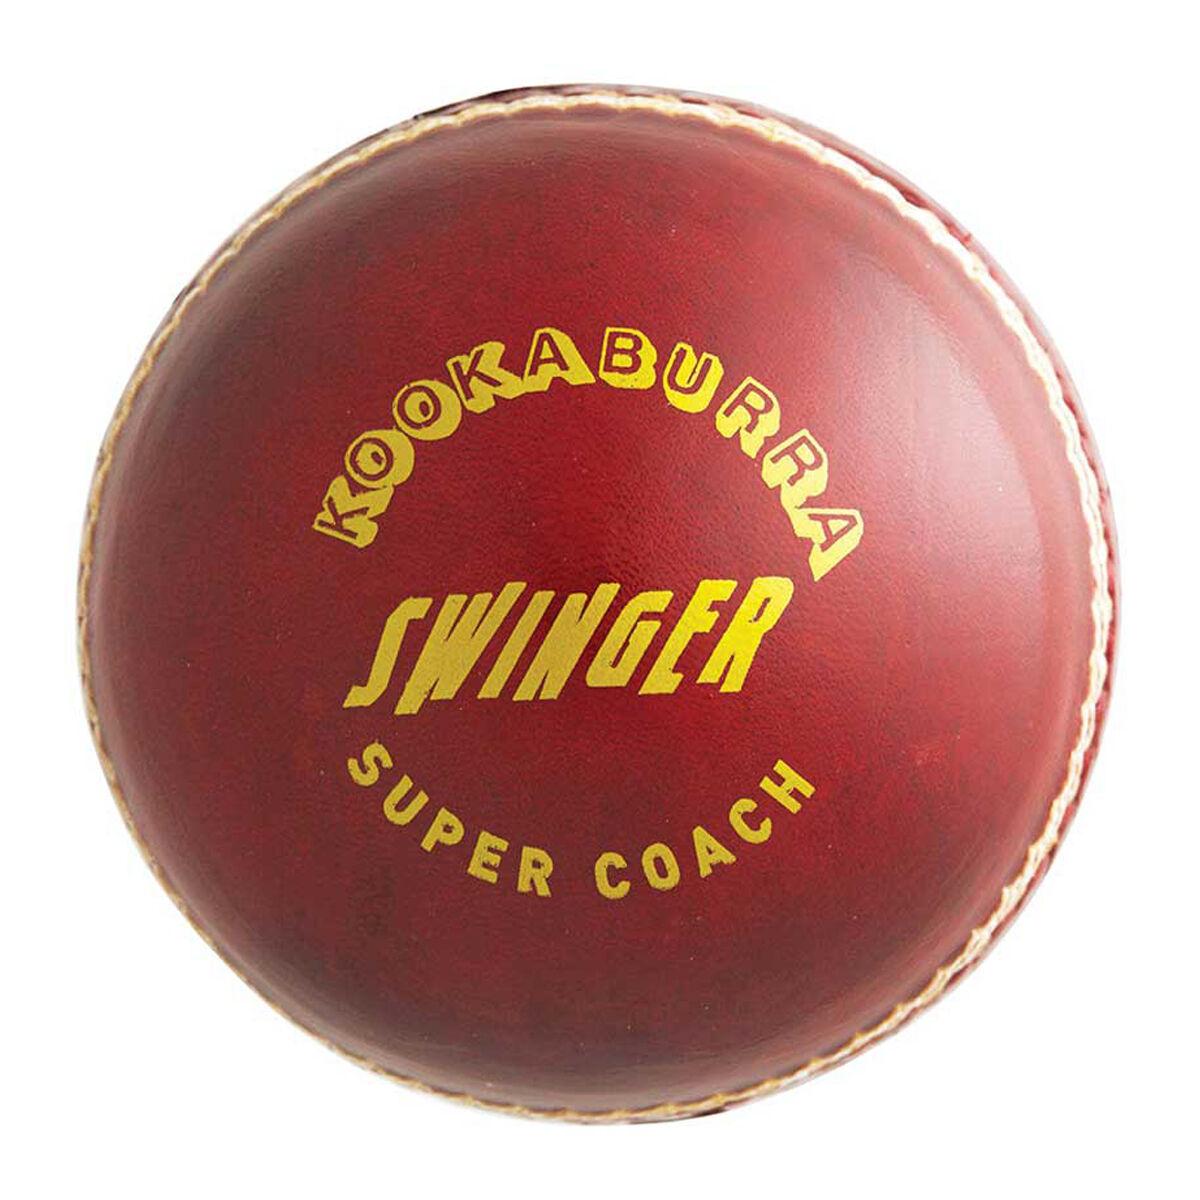 Cricket Training Ball Swing Demon Red White By Kookaburra